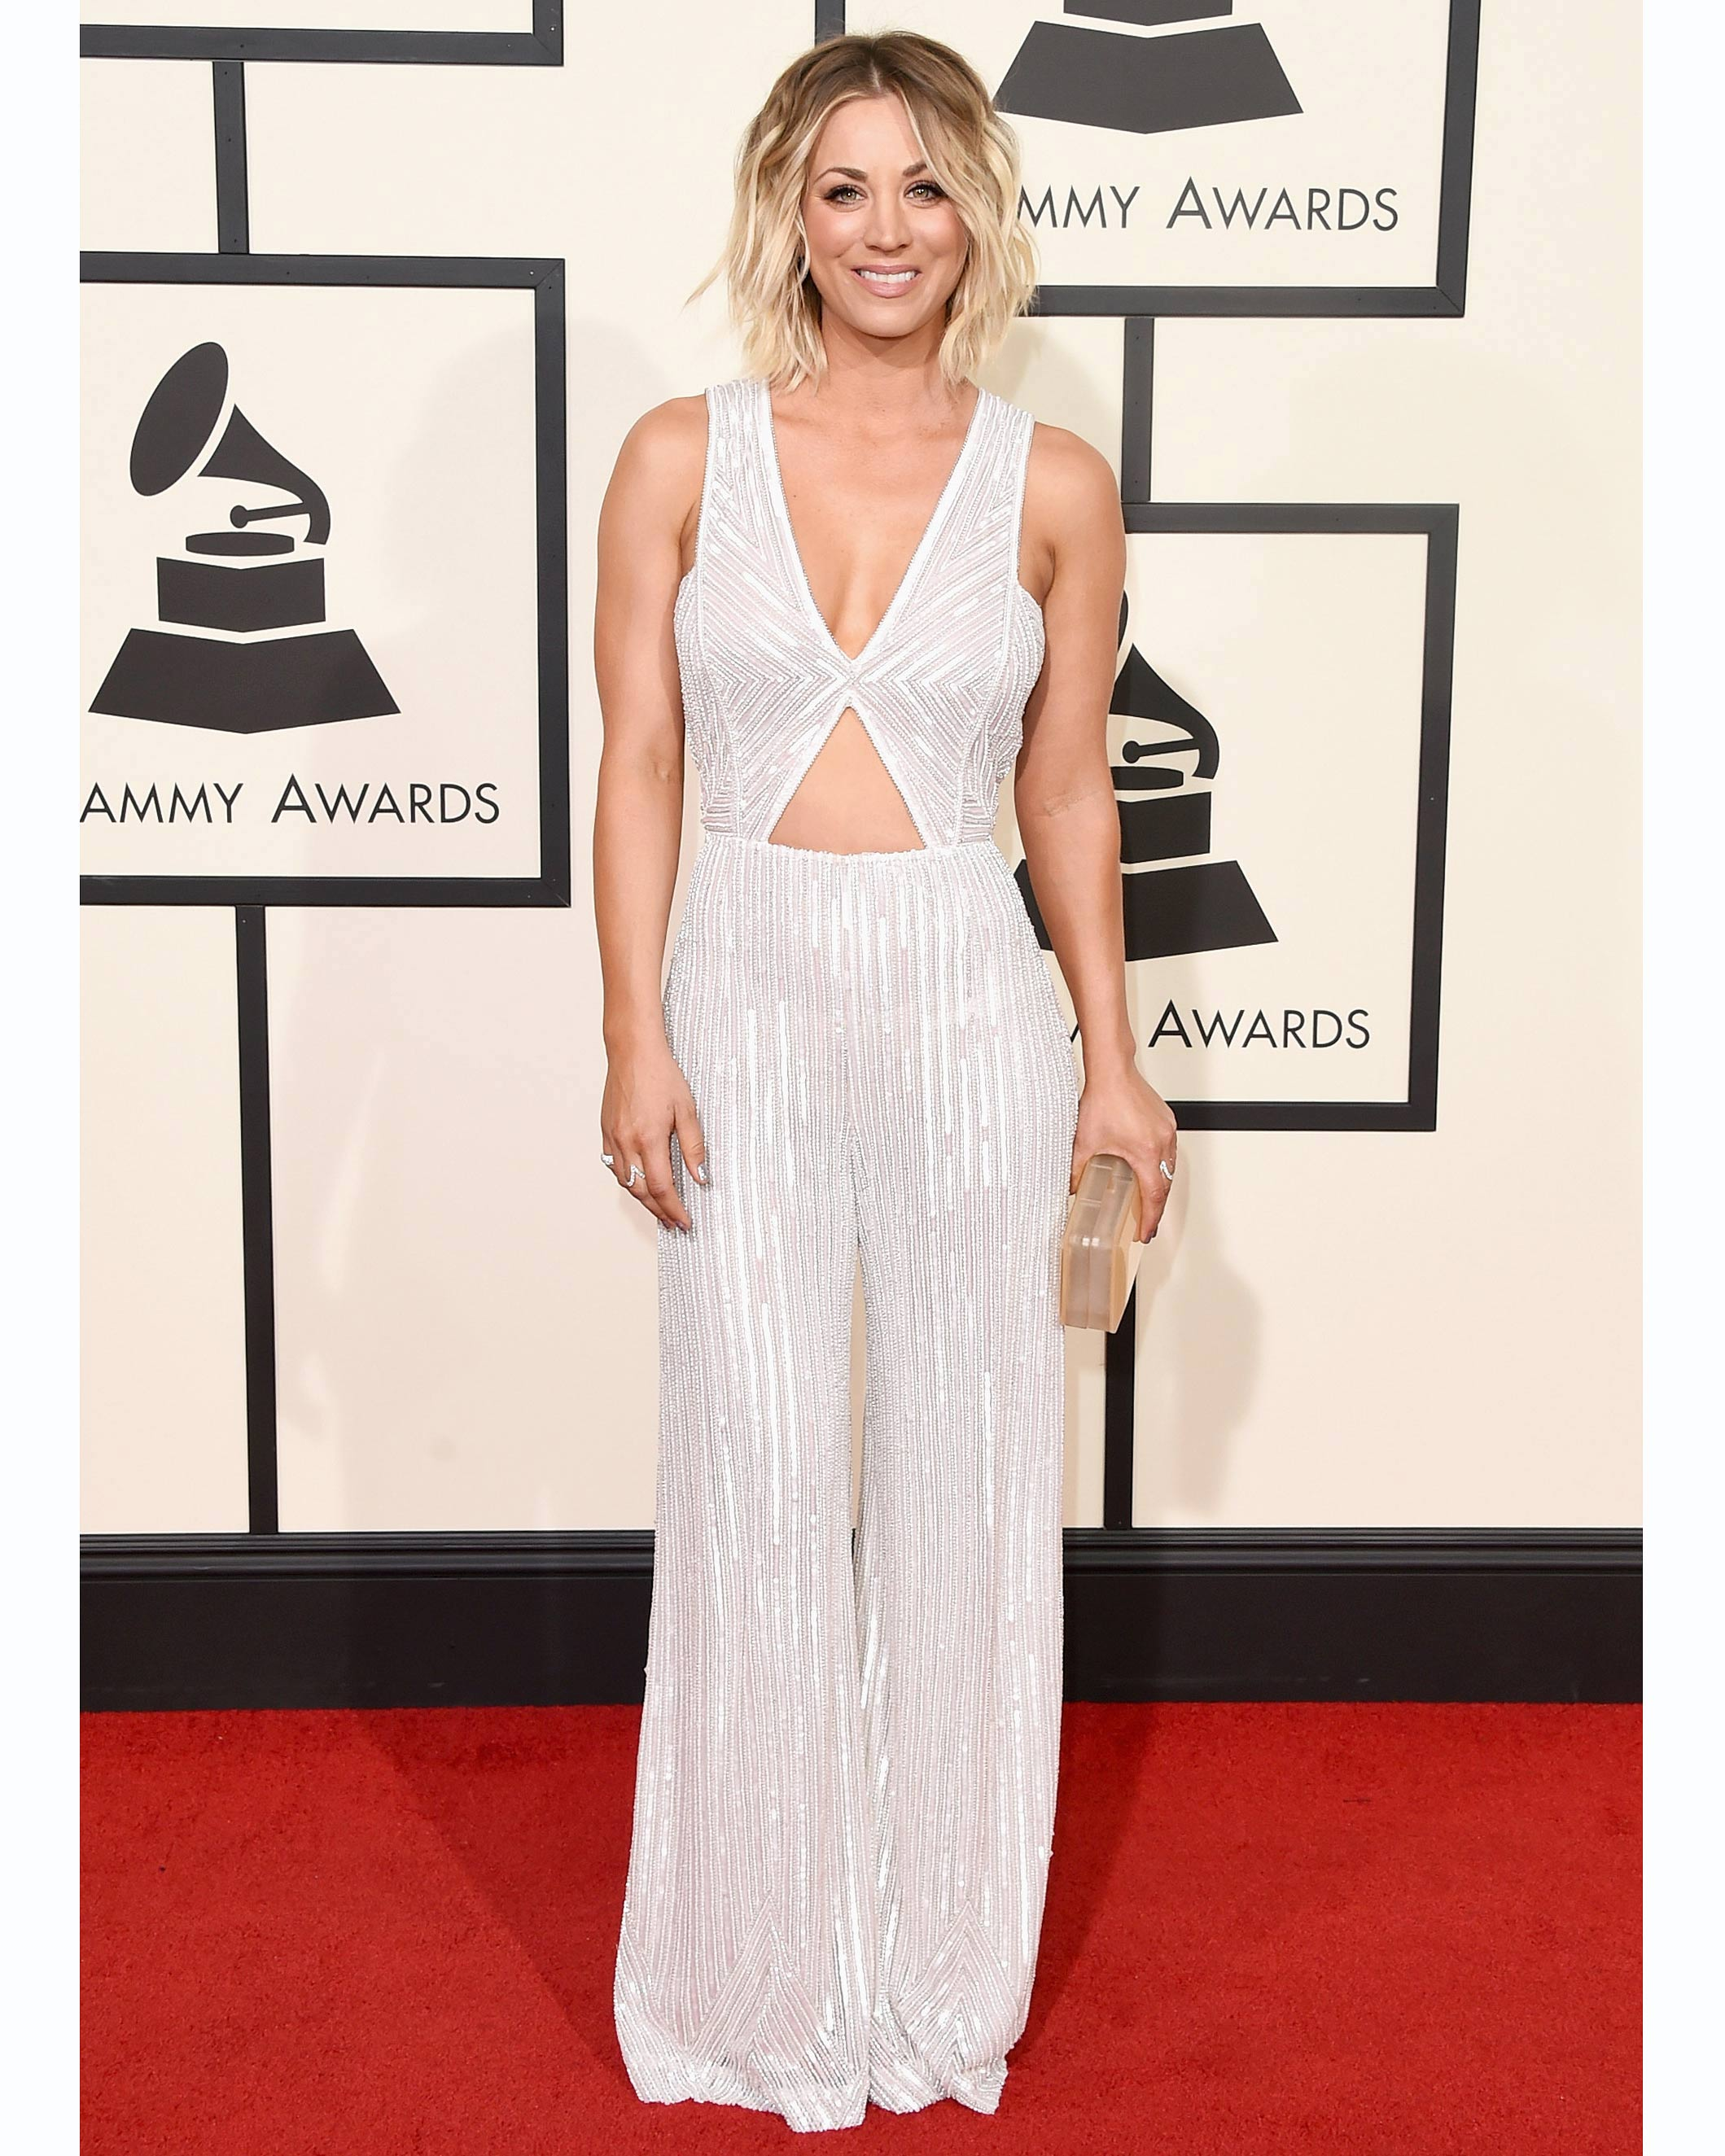 grammy-awards-2016-dresses-kaley-cuoco-0216.jpg